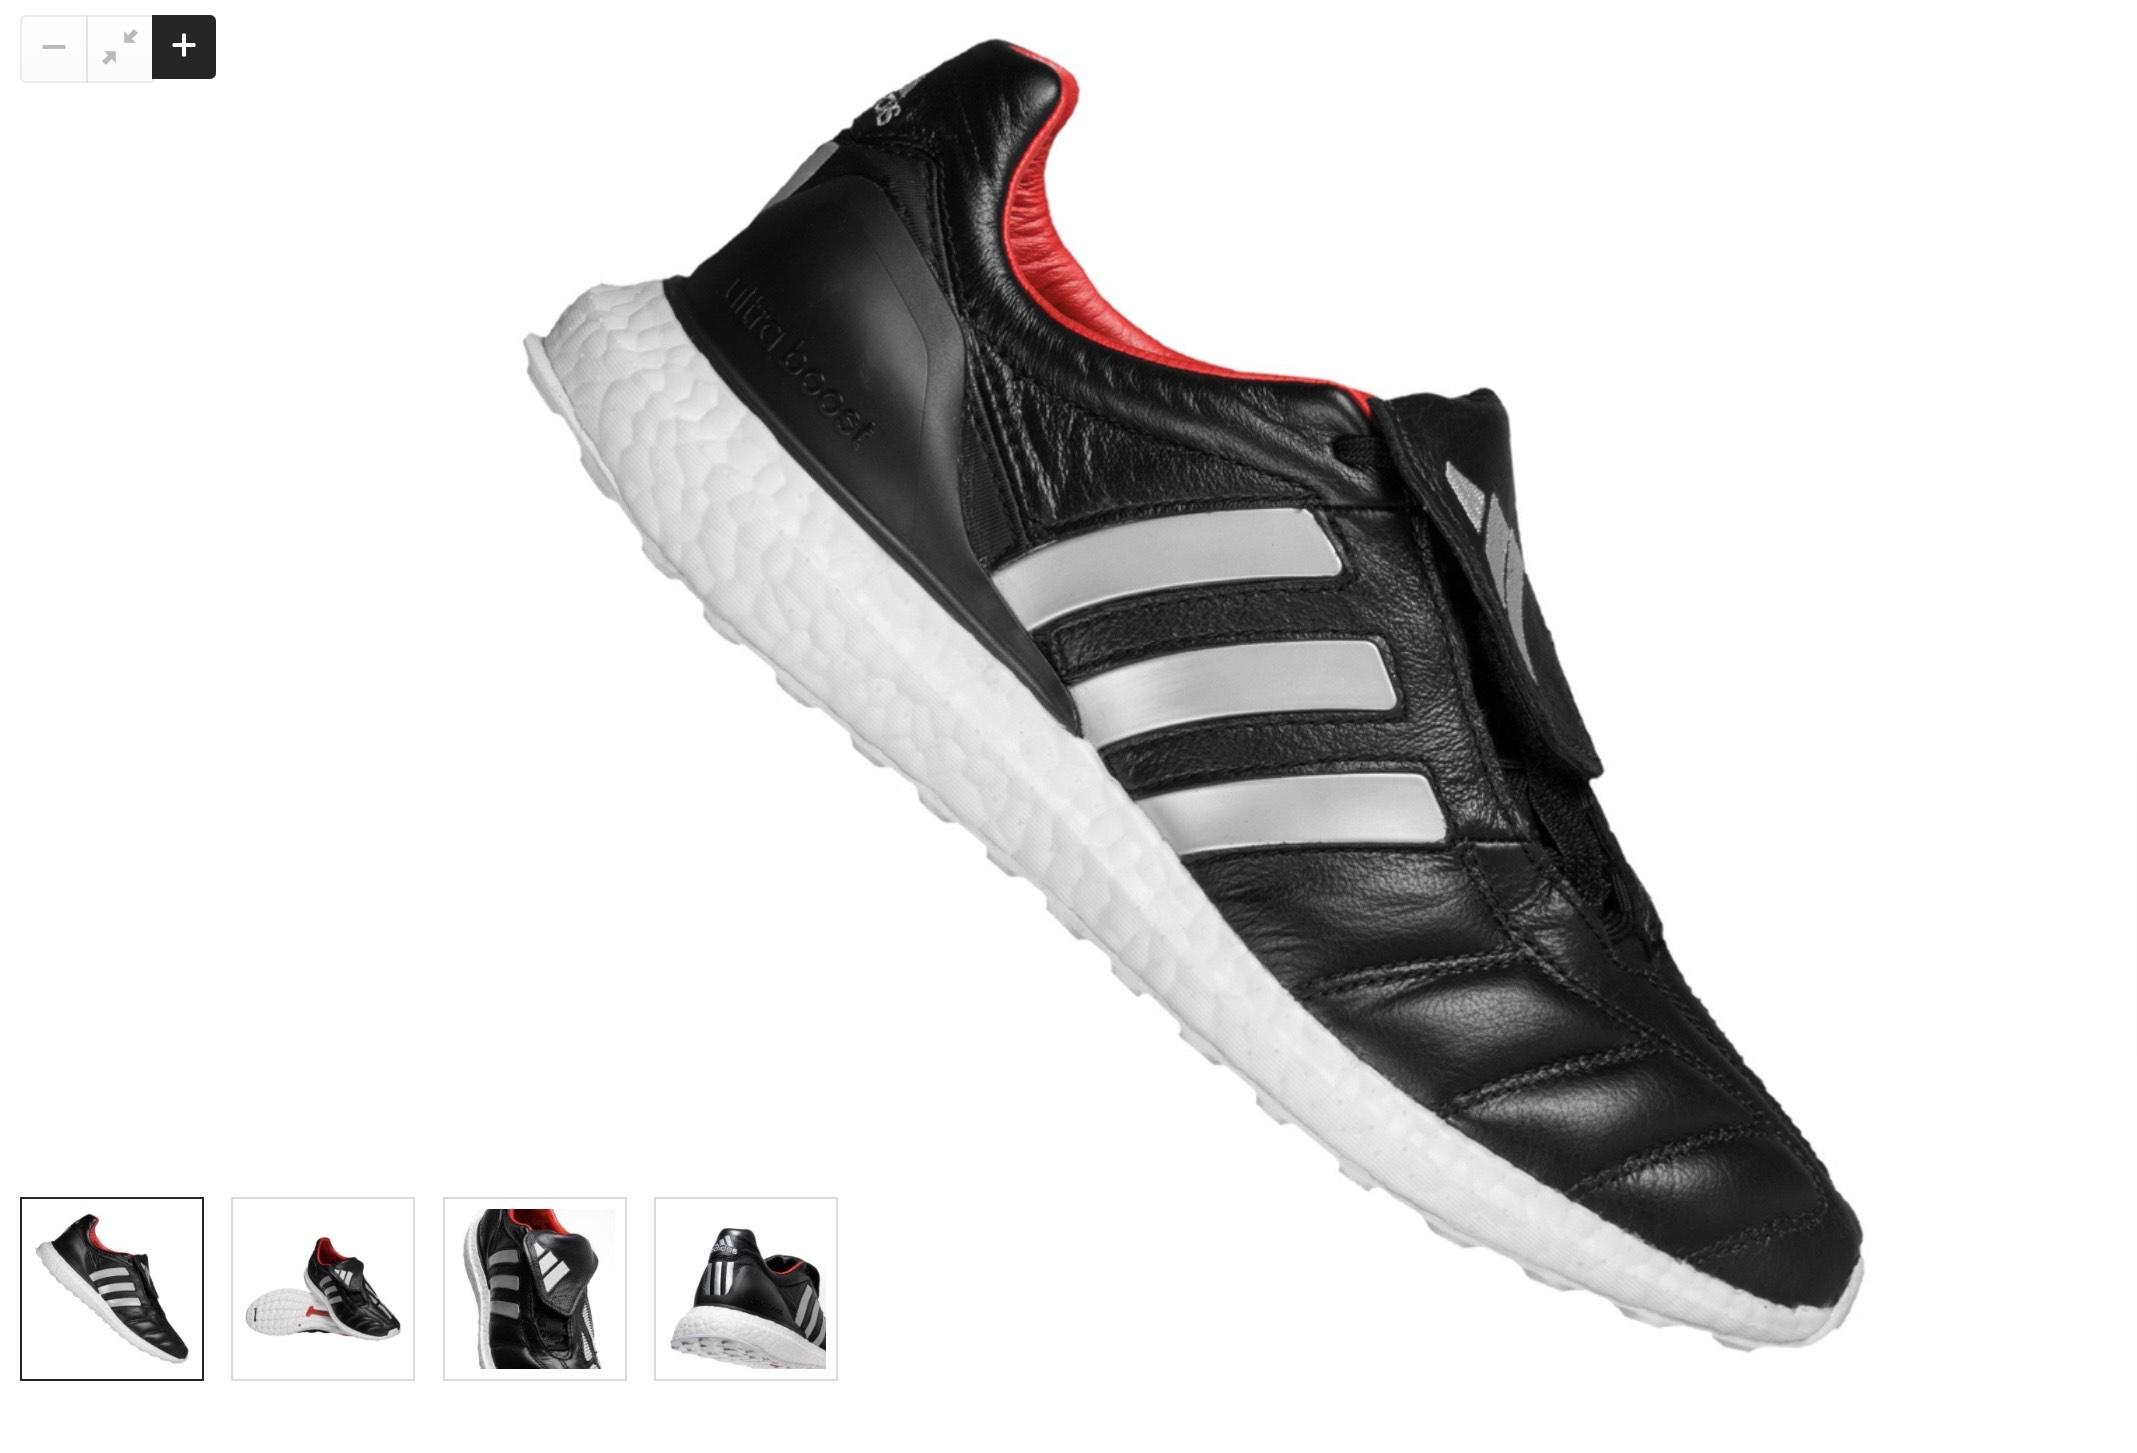 [SportSpar.de] Adidas Predator Mania TR Straßen Fußballschuhe Größe 44